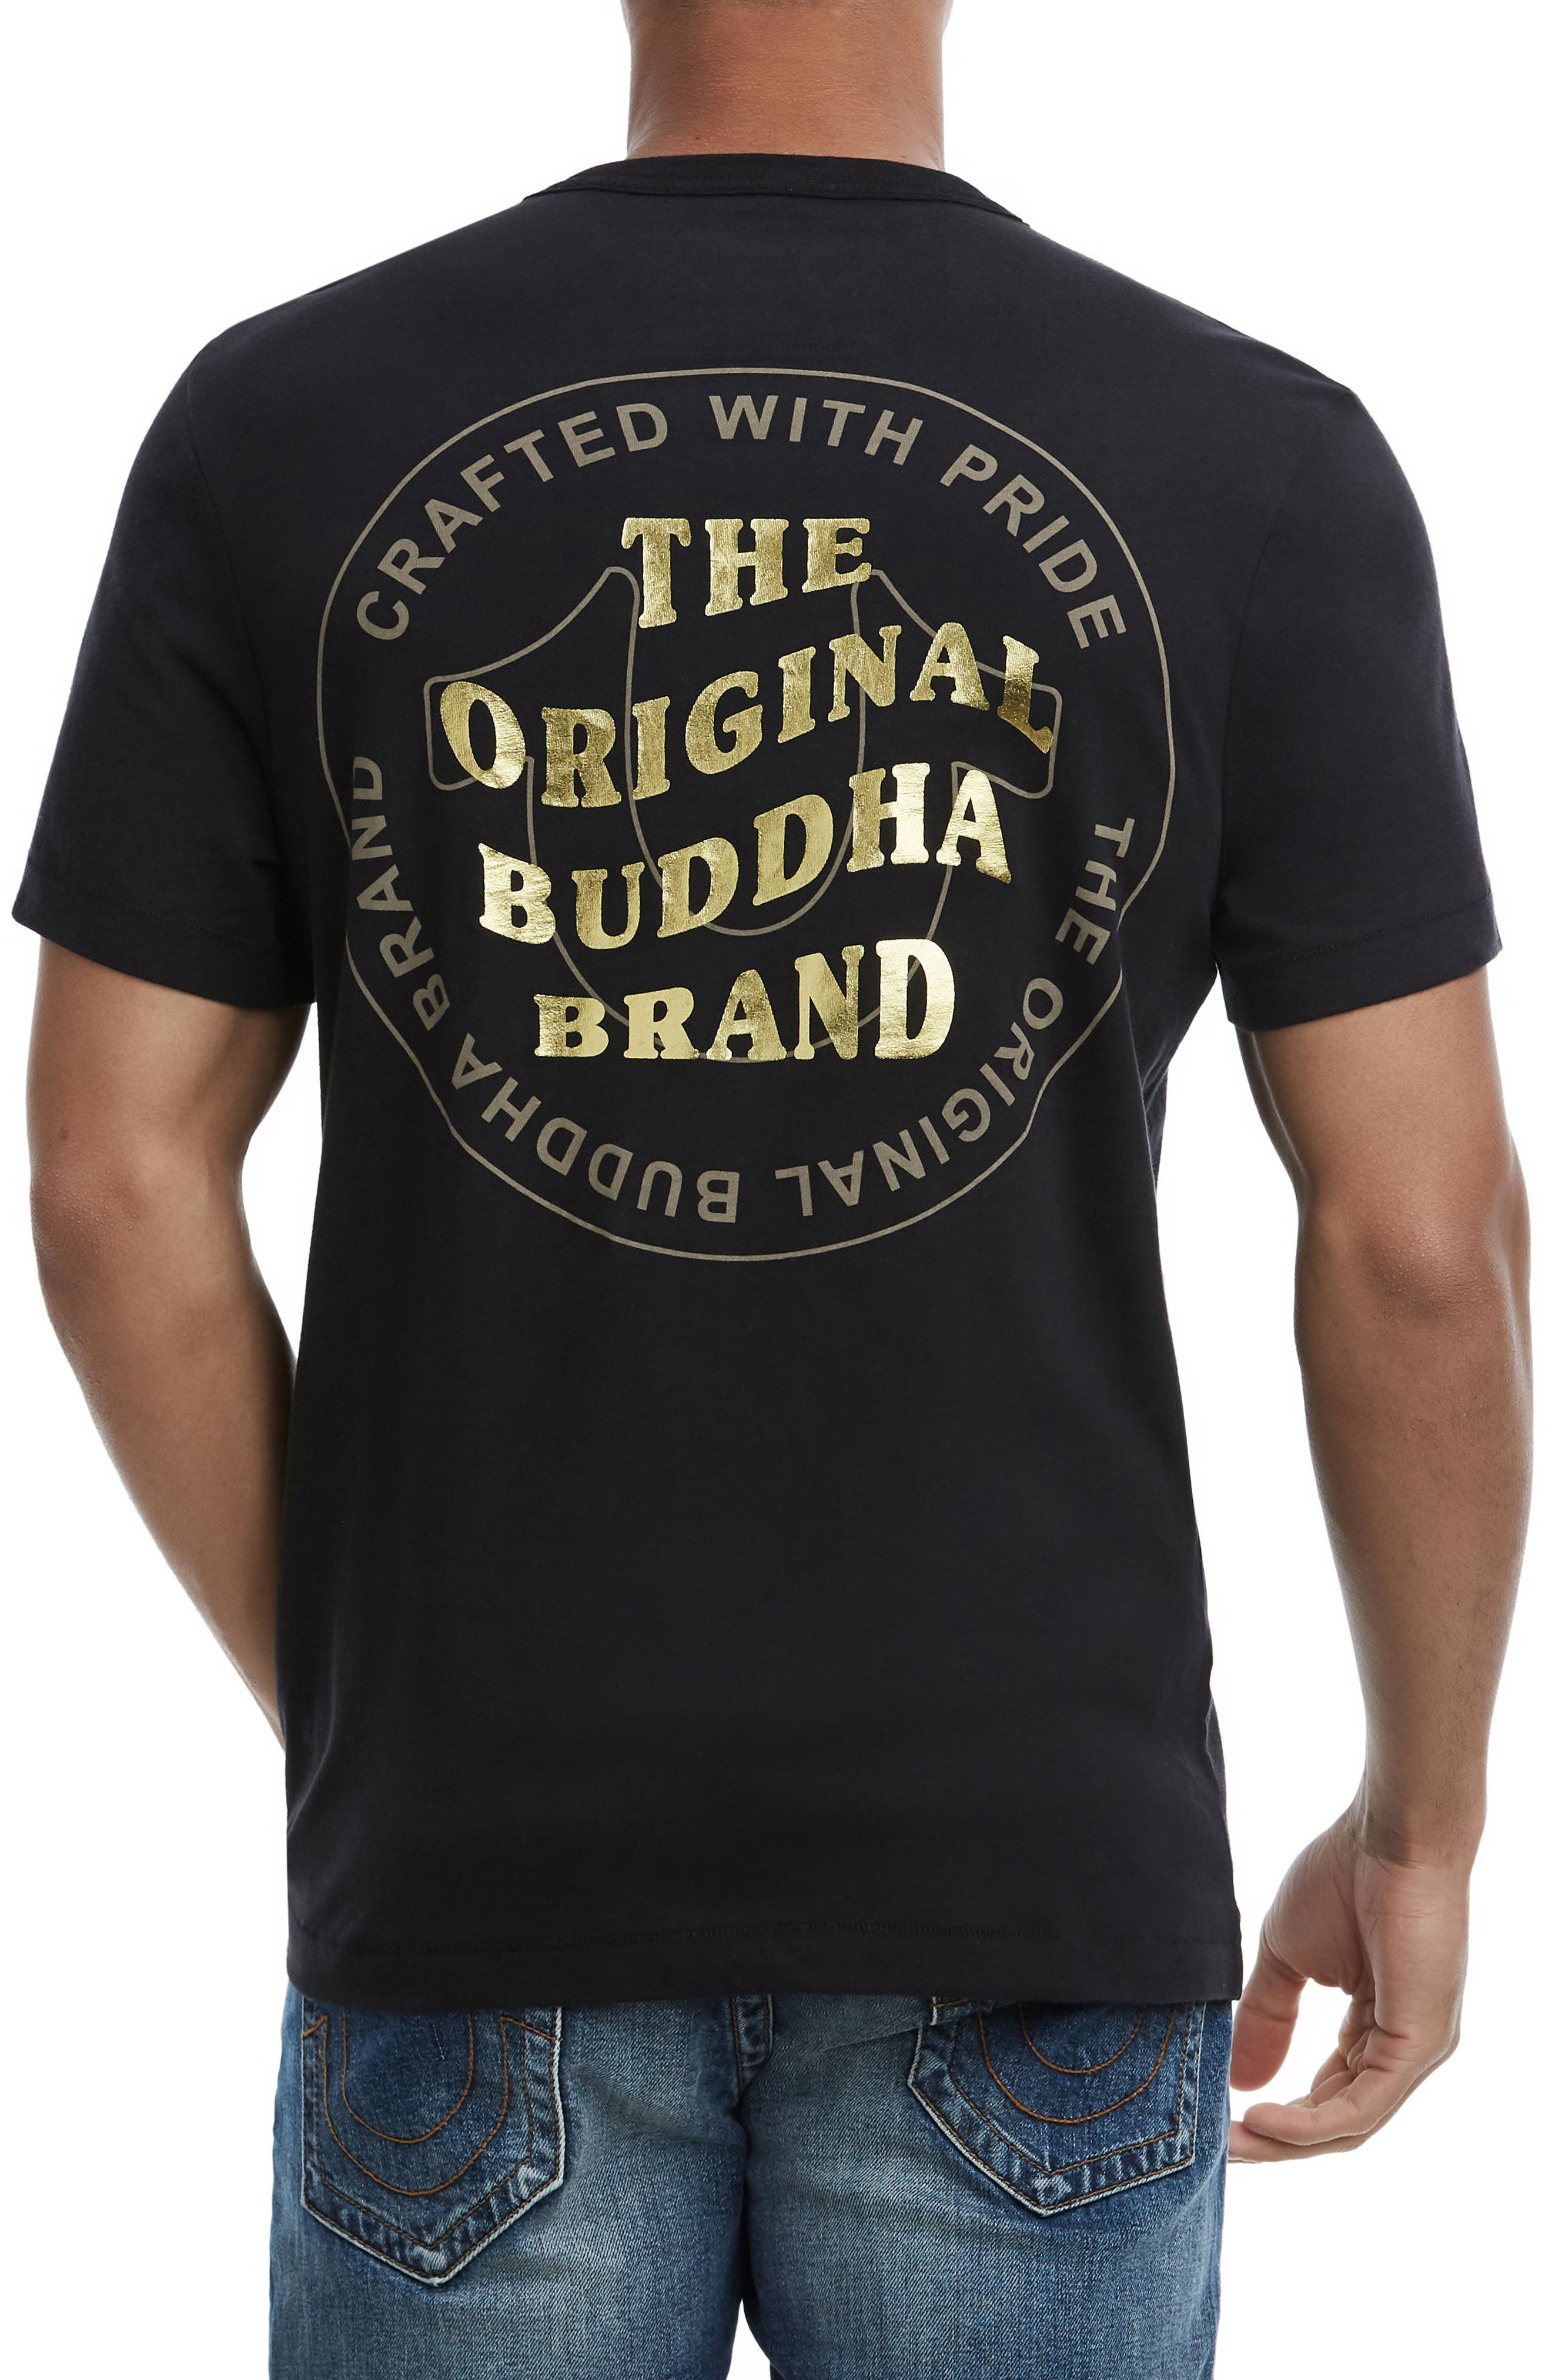 Wavy Buddha Brand T-Shirt,                             Alternate thumbnail 2, color,                             001